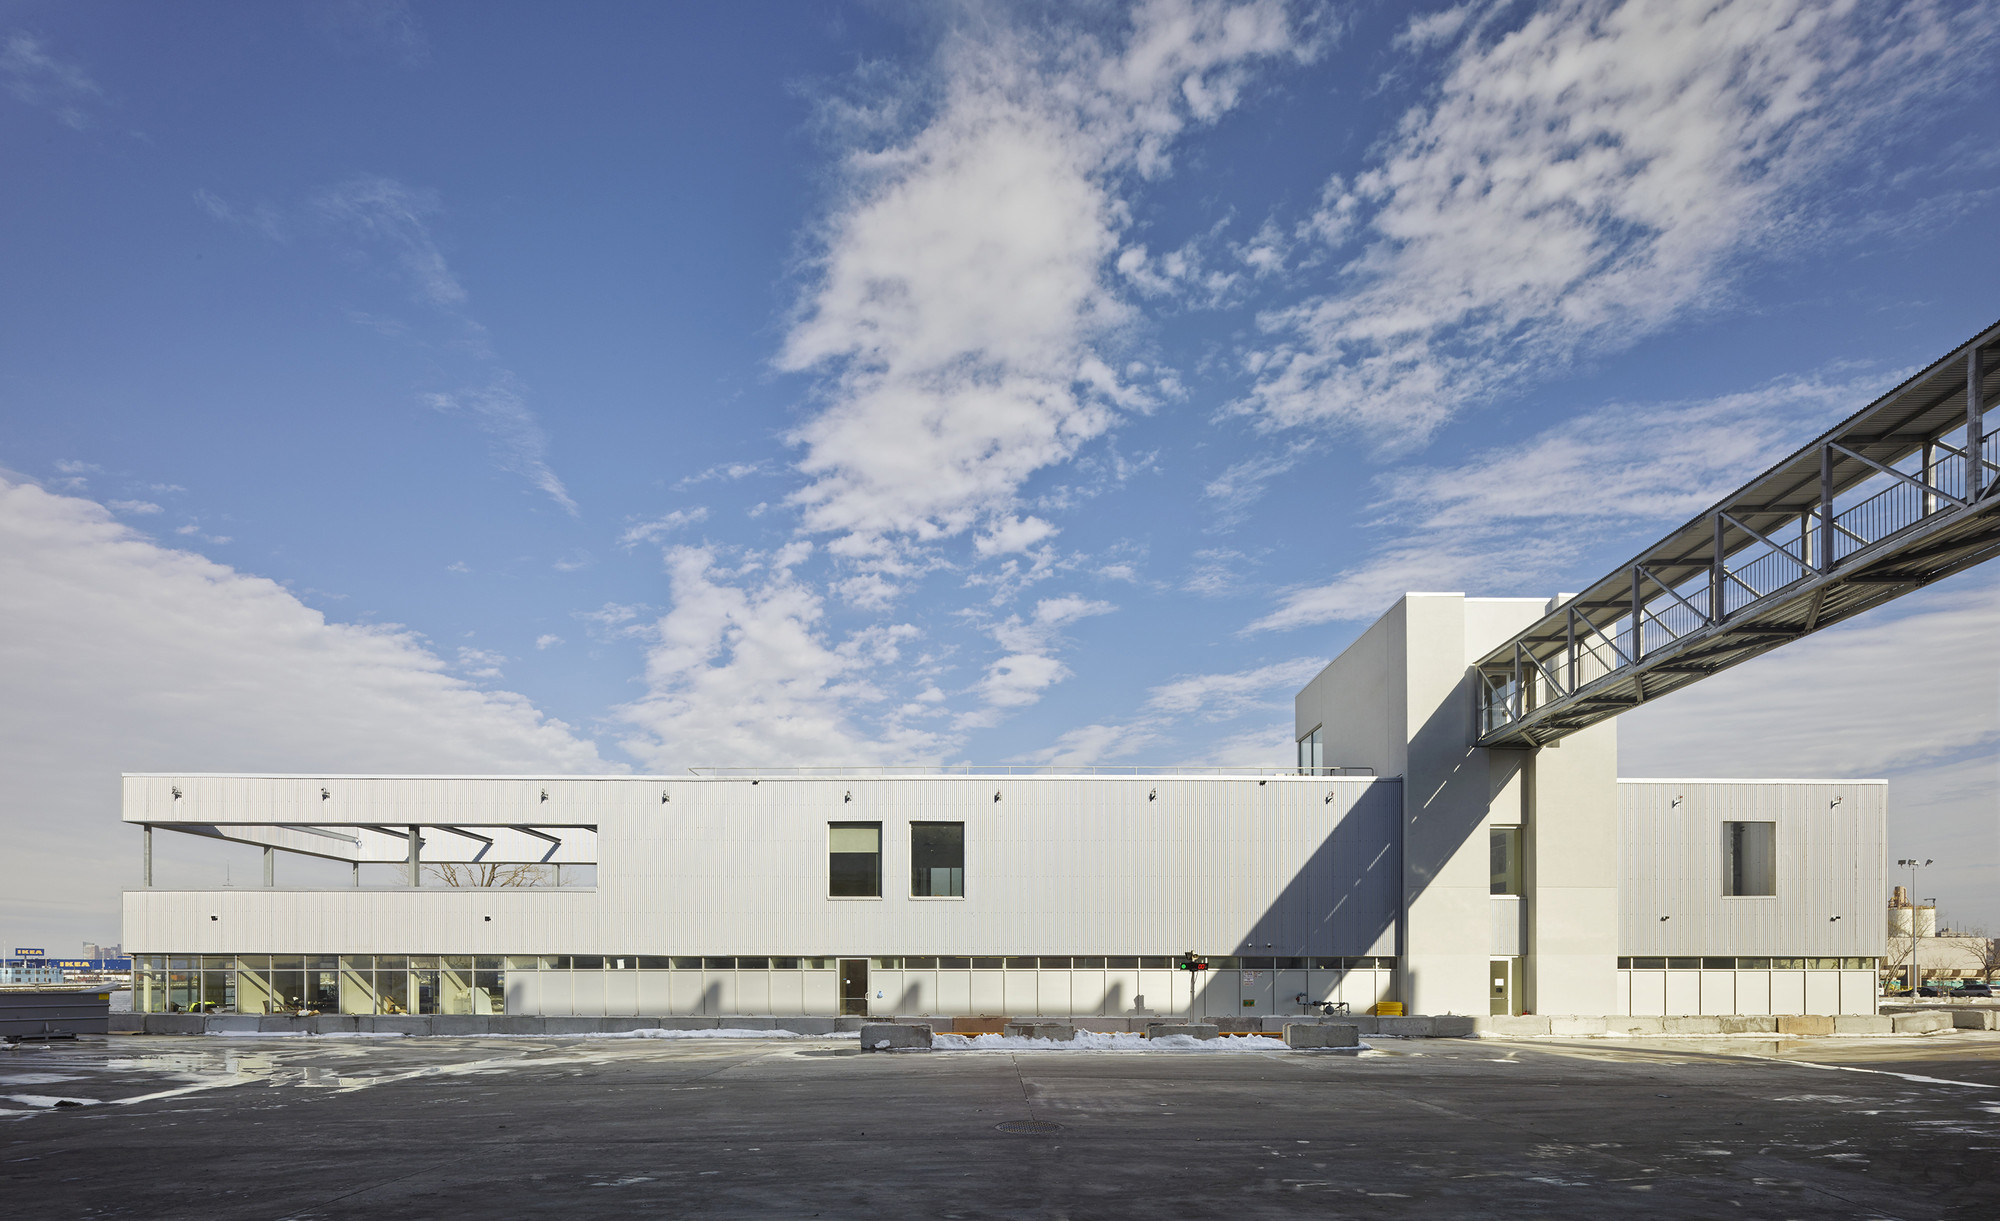 Sunset Park Material Recovery Facility / Selldorf Architects, © Nikolas Koenig